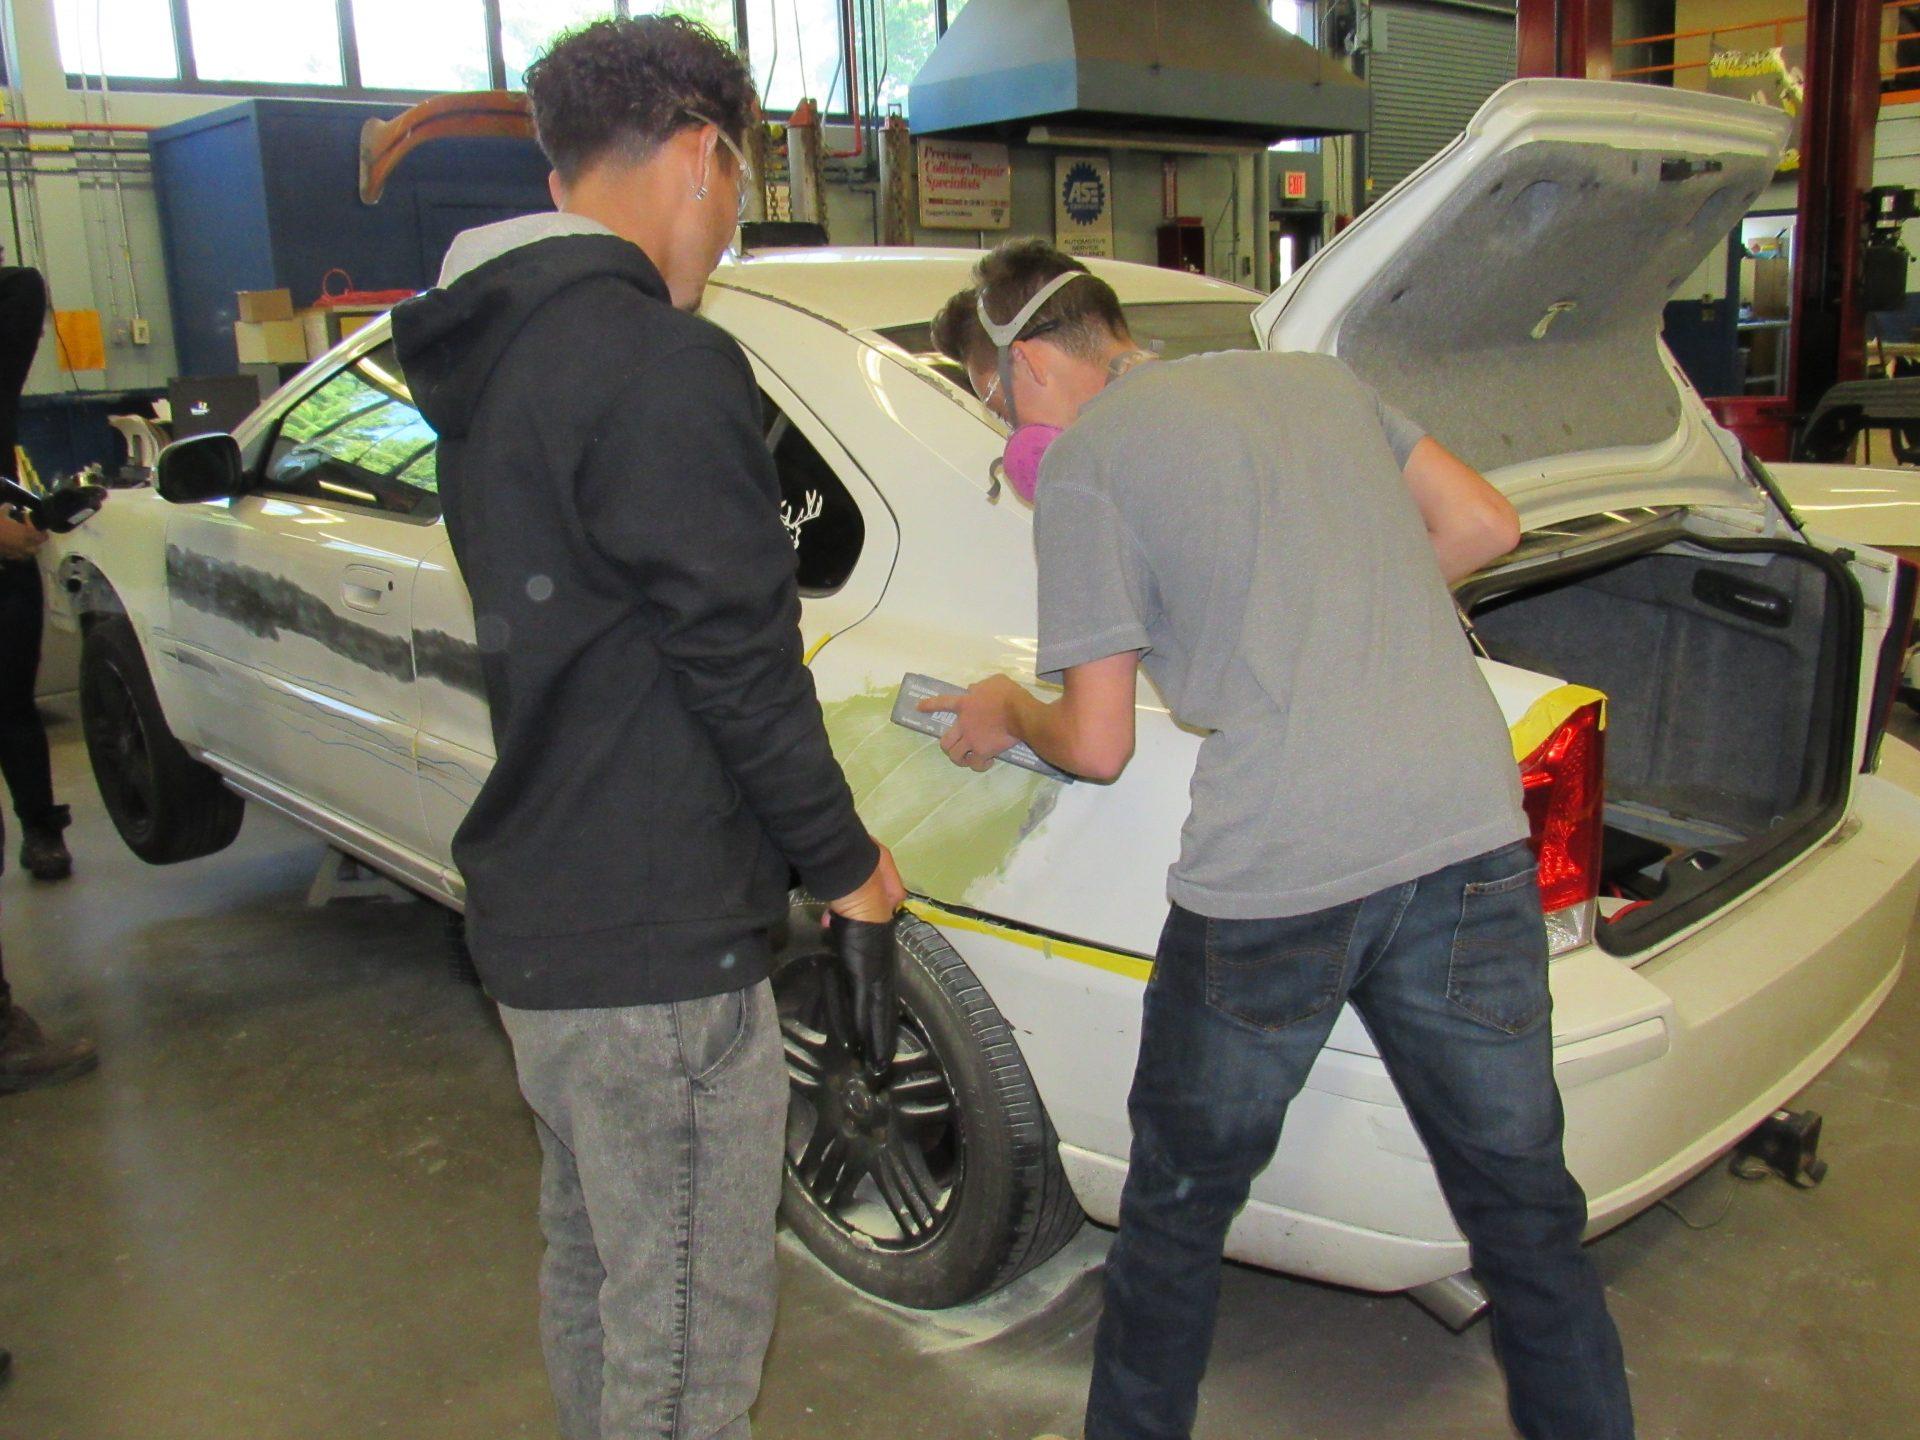 Collision students sanding car